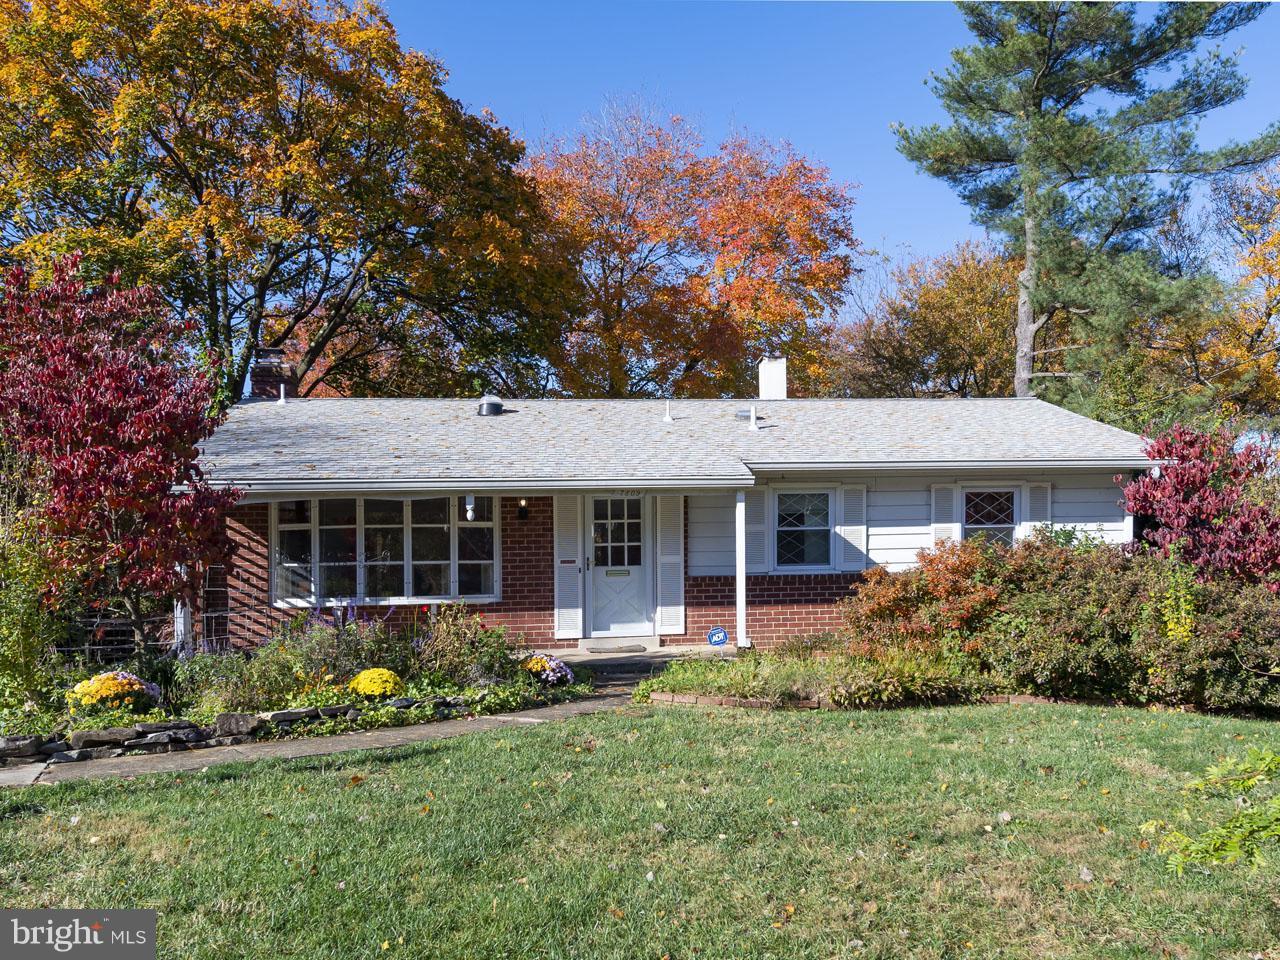 VAFX101488-300978888385-2021-09-05-13-51-04  |   | Annandale Delaware Real Estate For Sale | MLS# Vafx101488  - Best of Northern Virginia